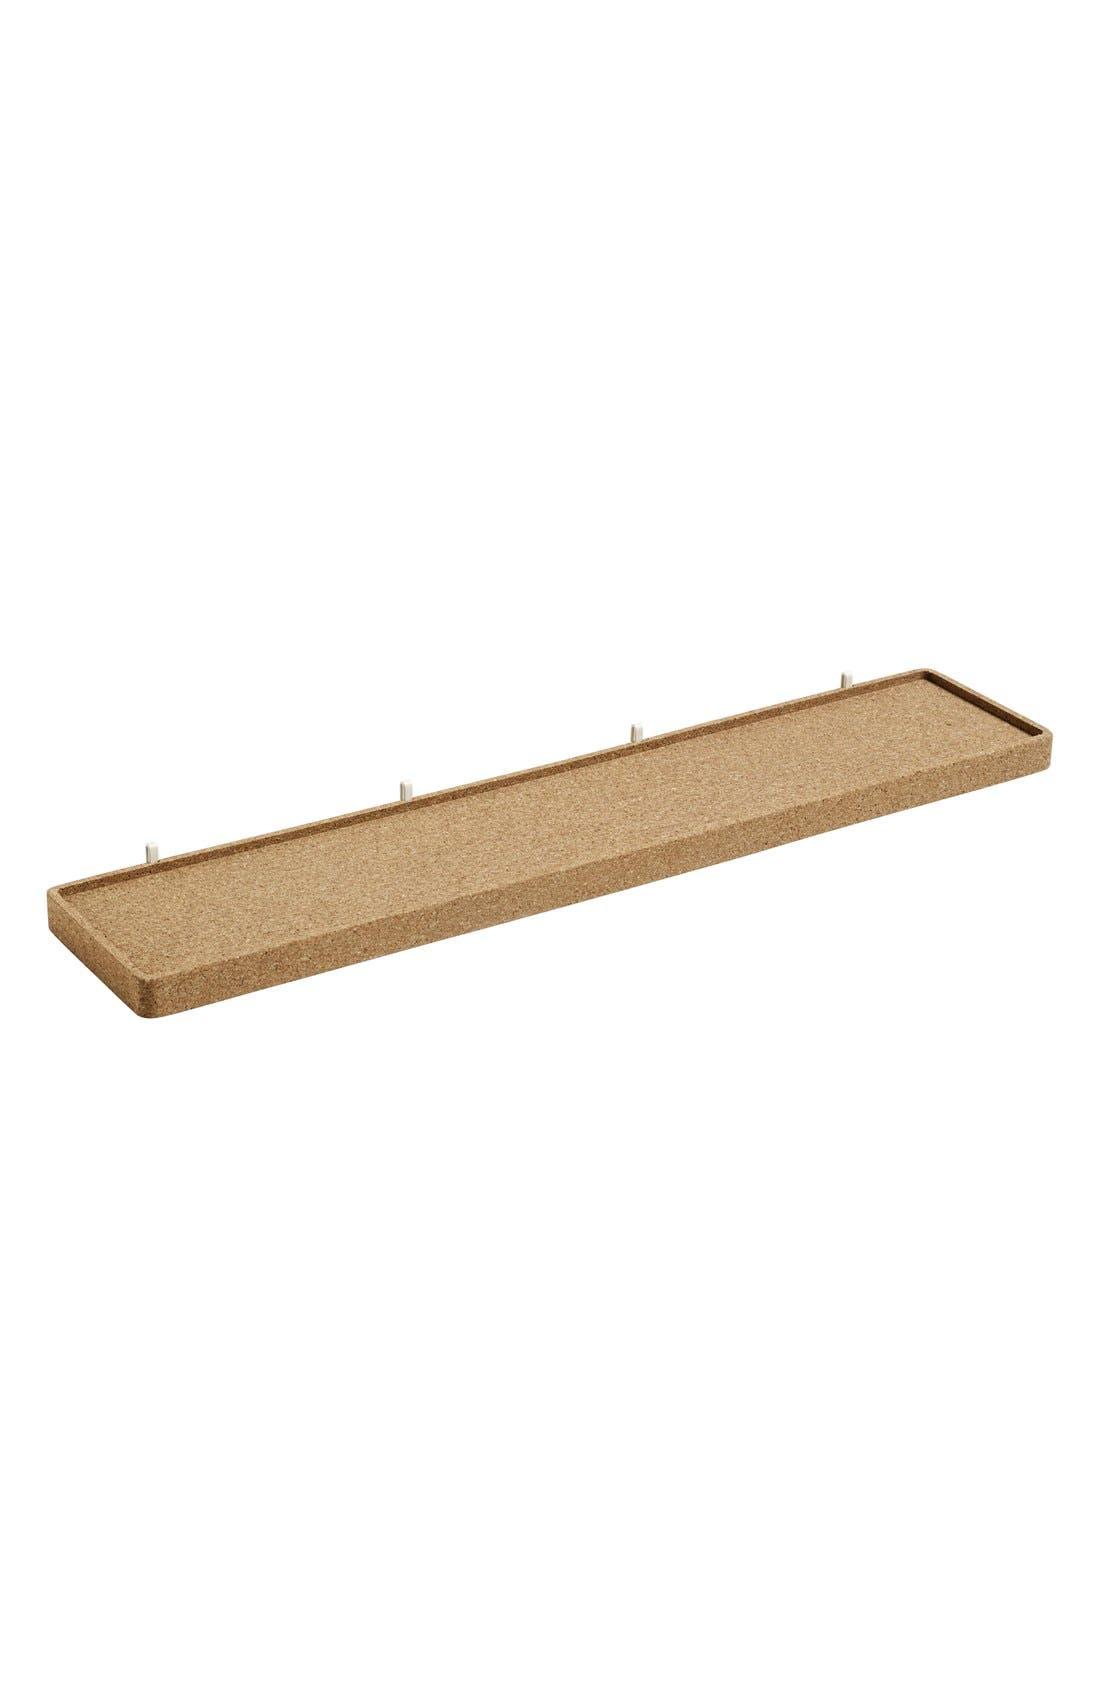 Main Image - HAY 'Pinorama - Large' Cork Shelf